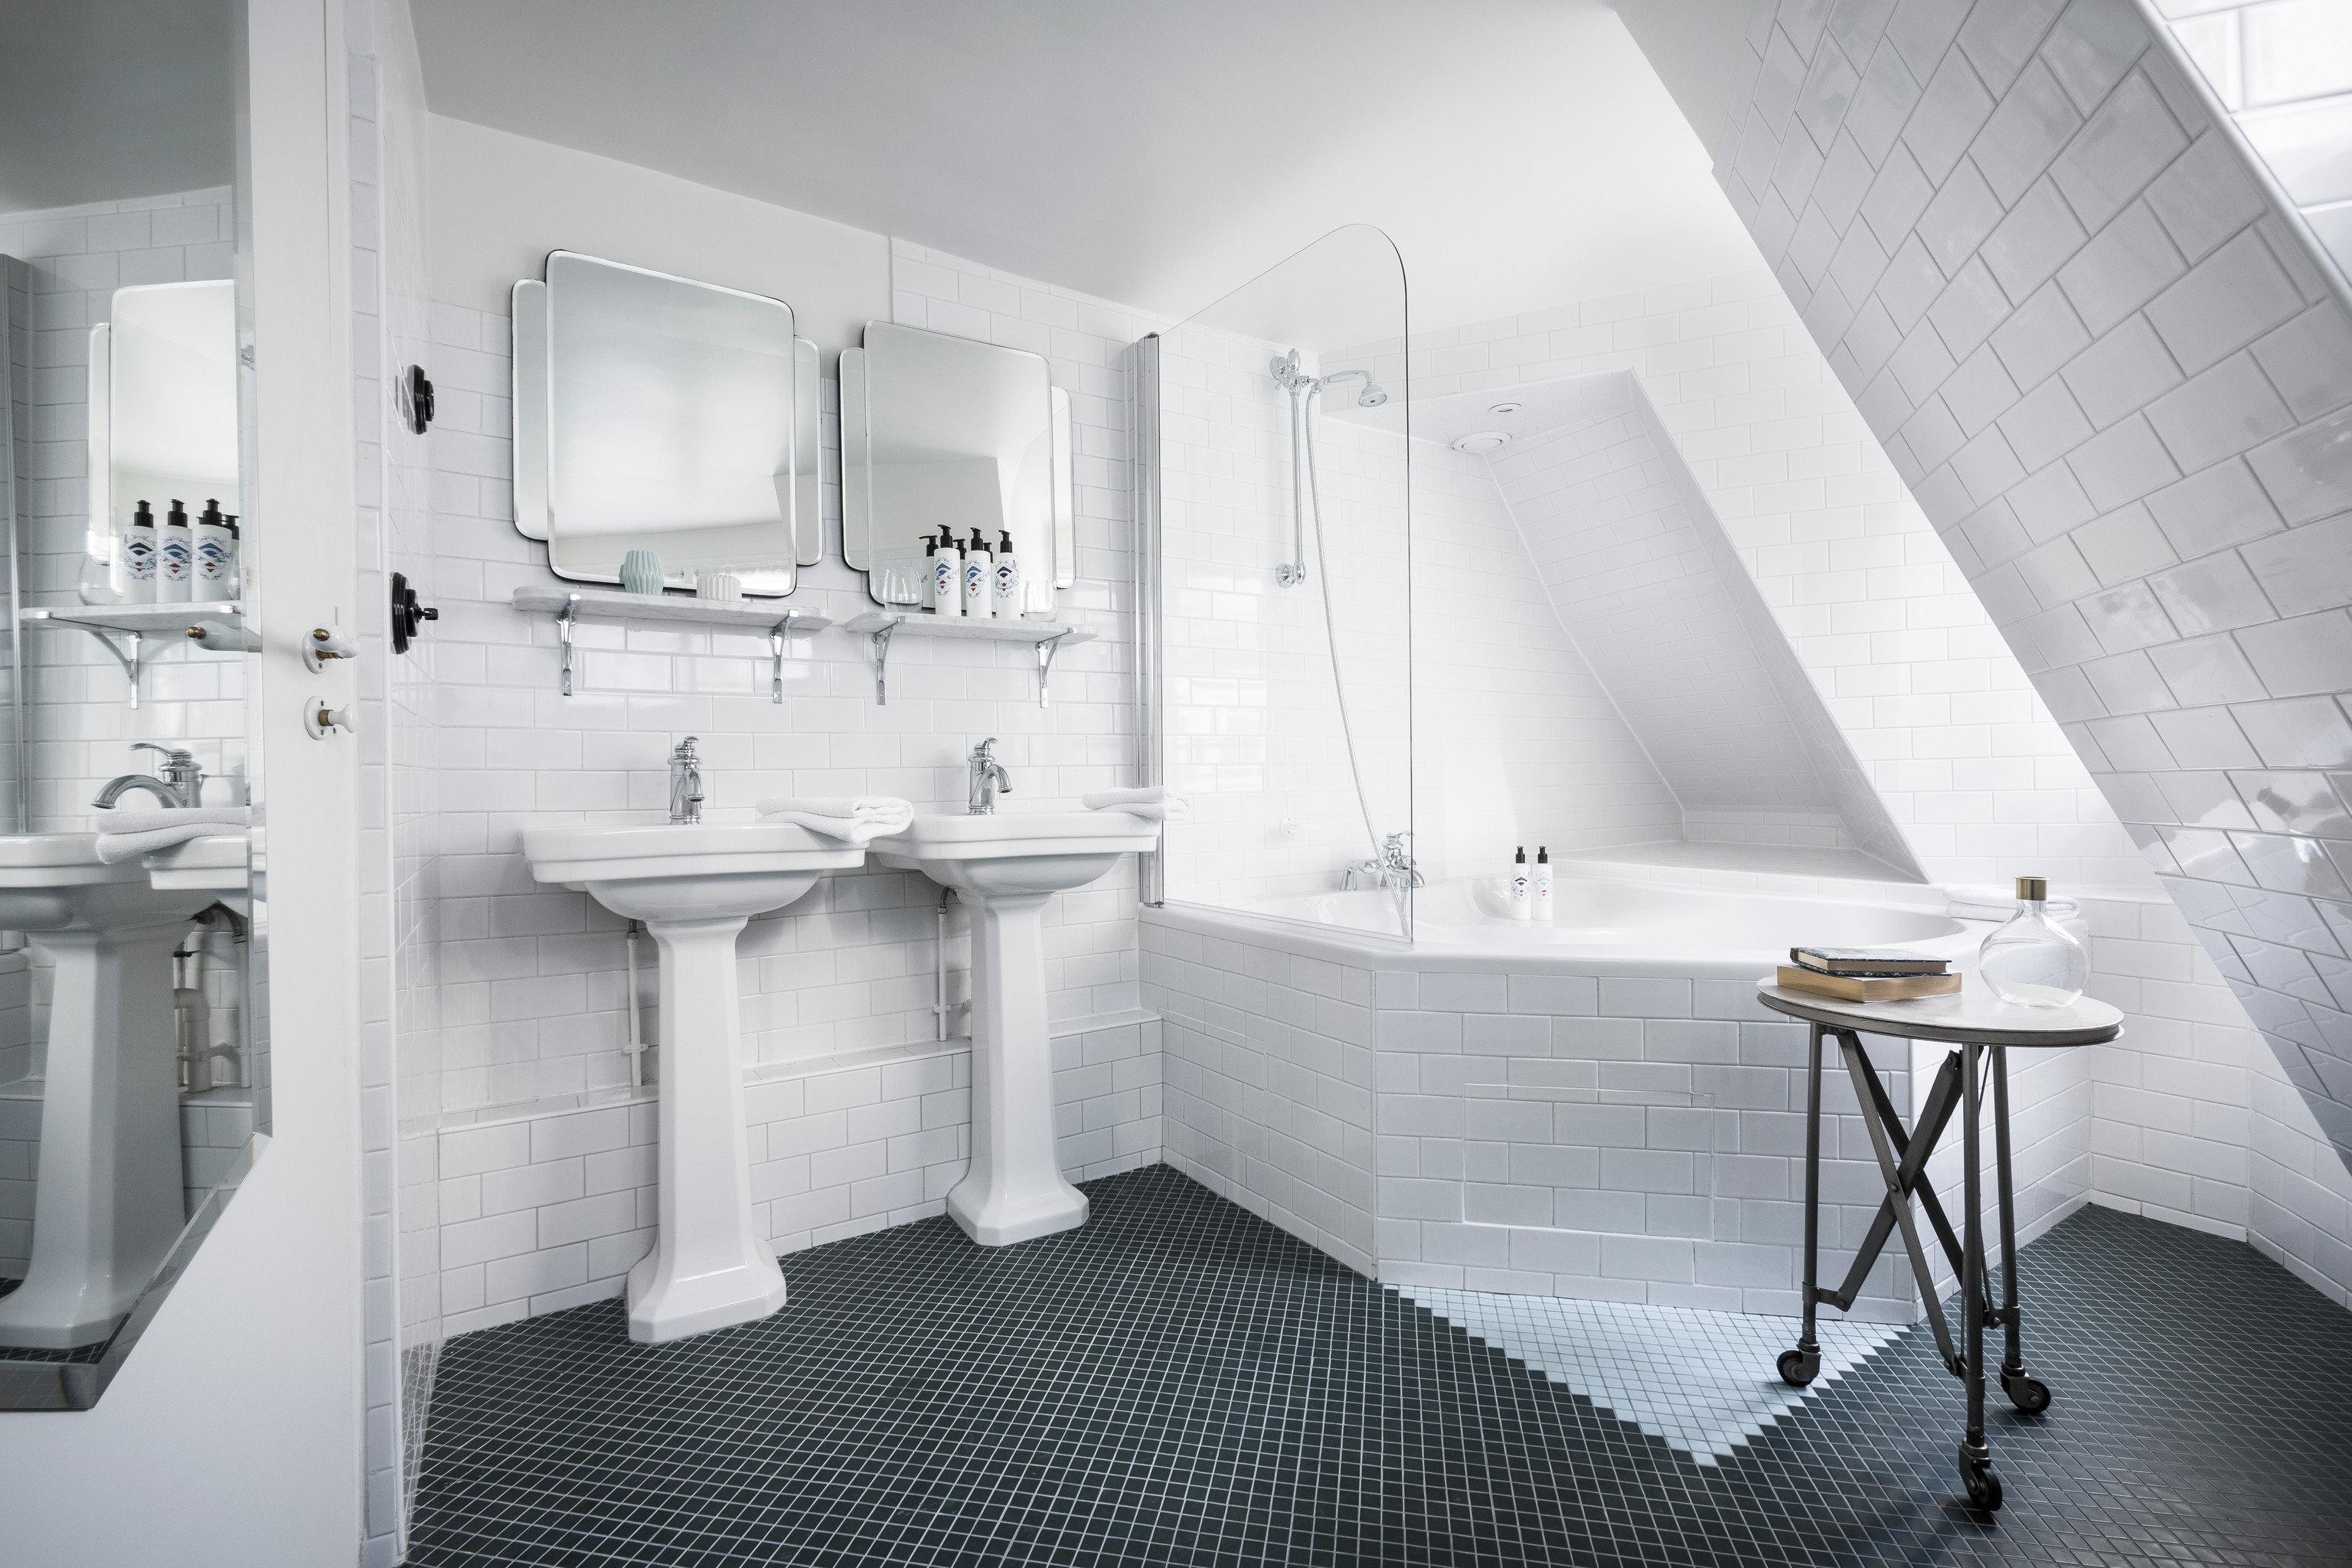 property bathroom toilet bidet plumbing fixture bathtub